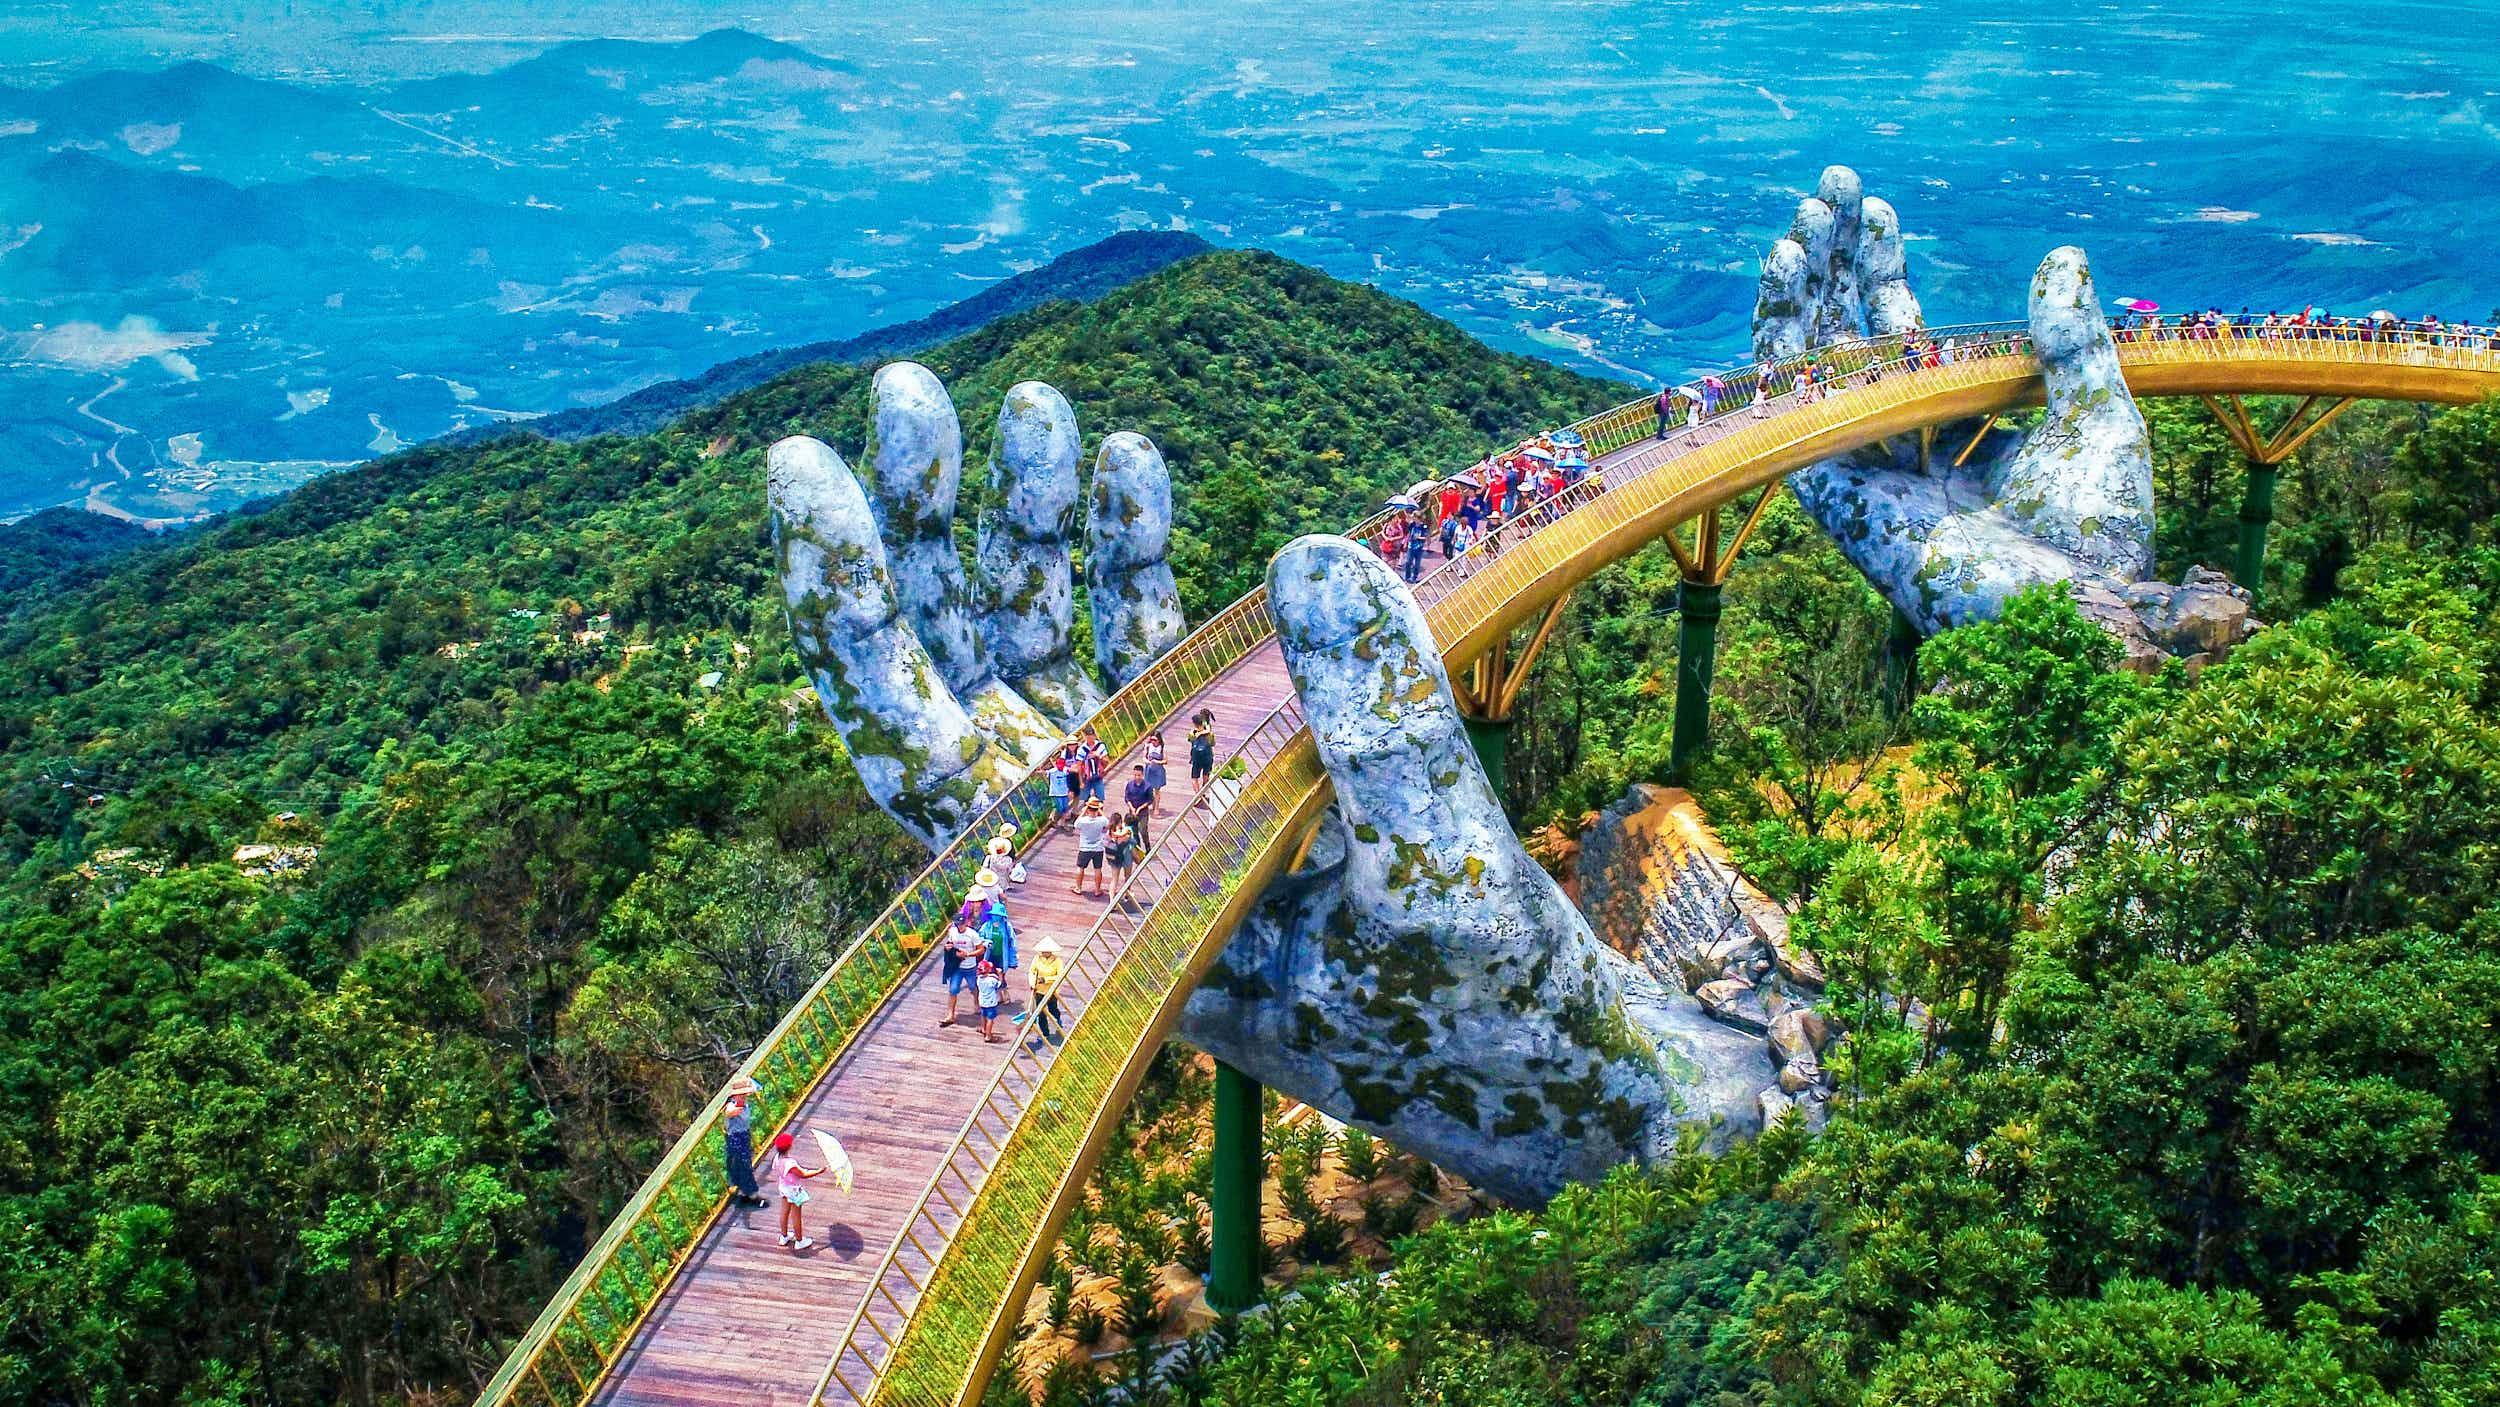 Vietnam's new golden bridge is held up by these enormous stone hands